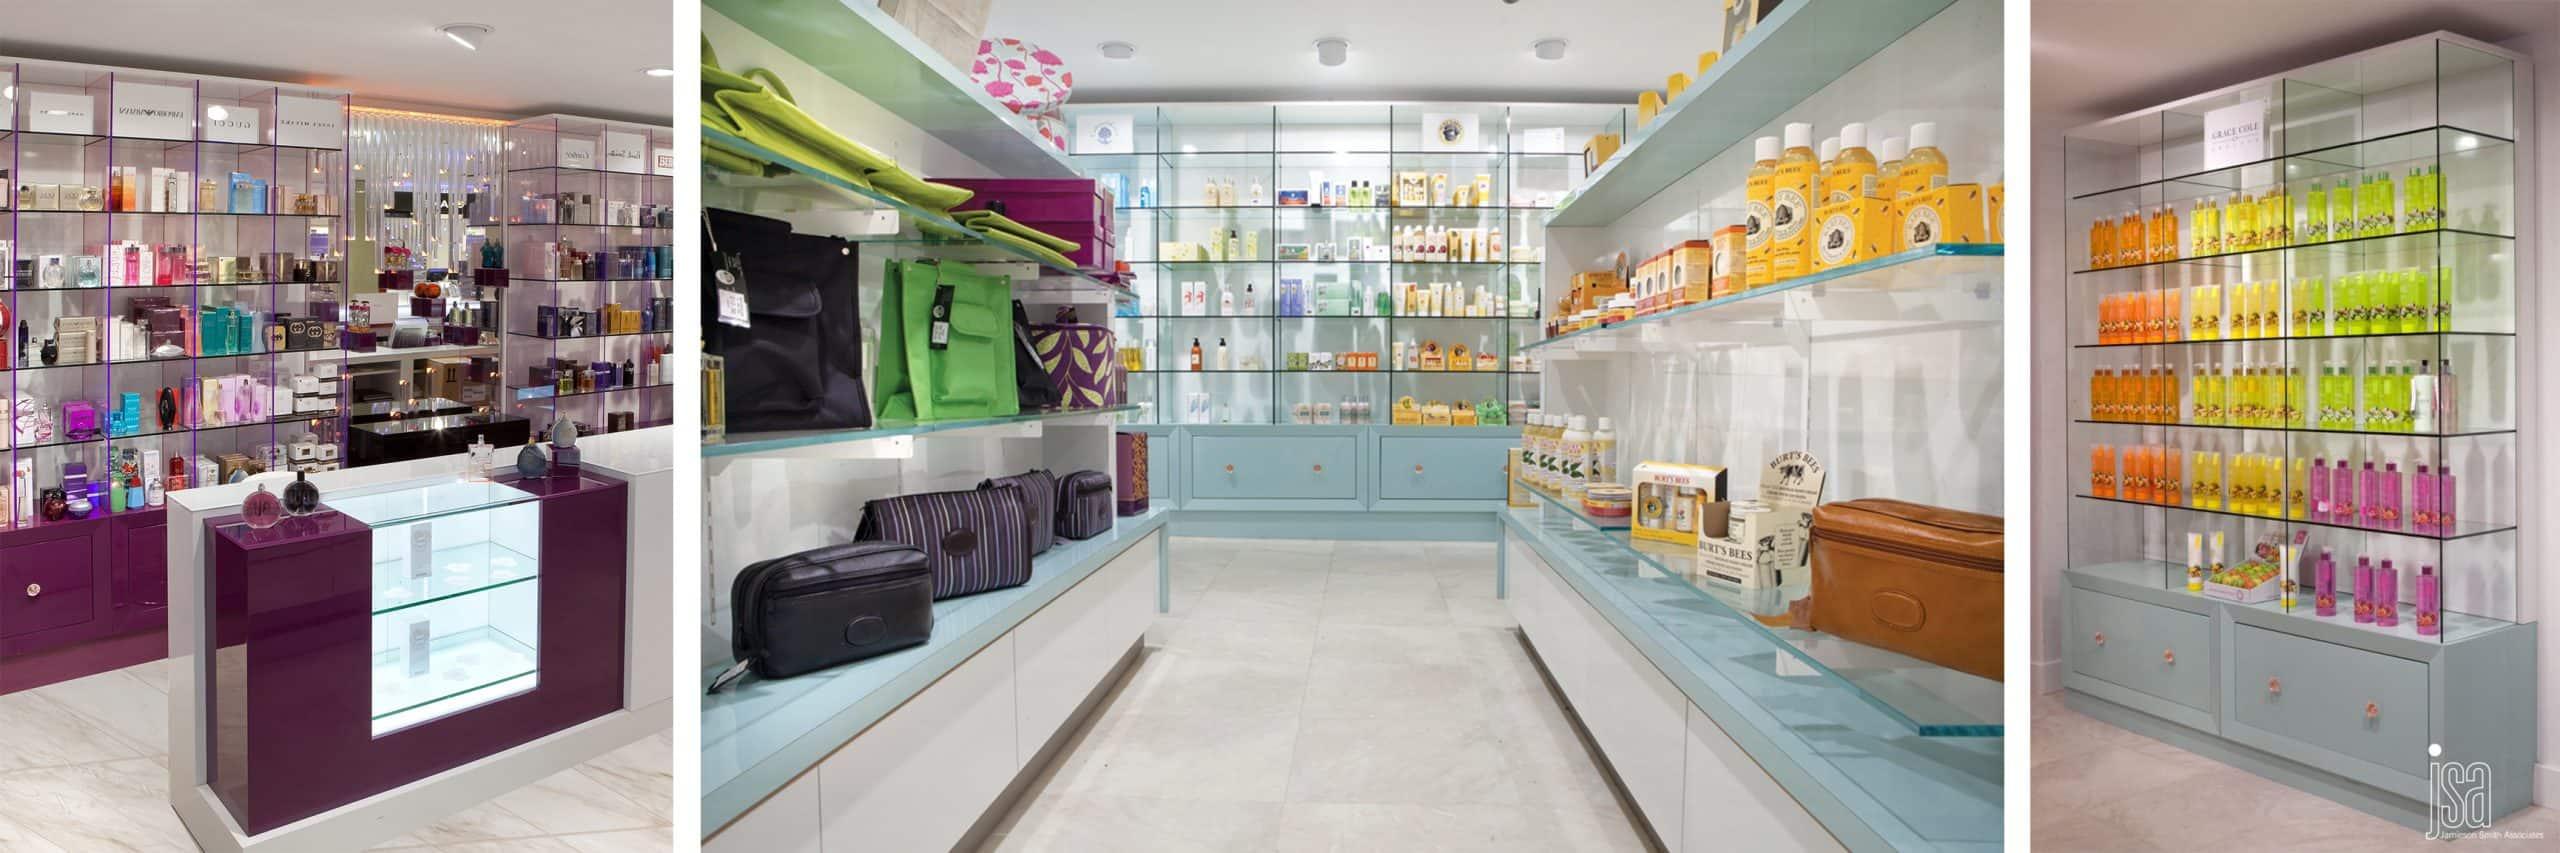 Yellow Brick Road Interior Design Devon - Barkers Cosmetics Hall